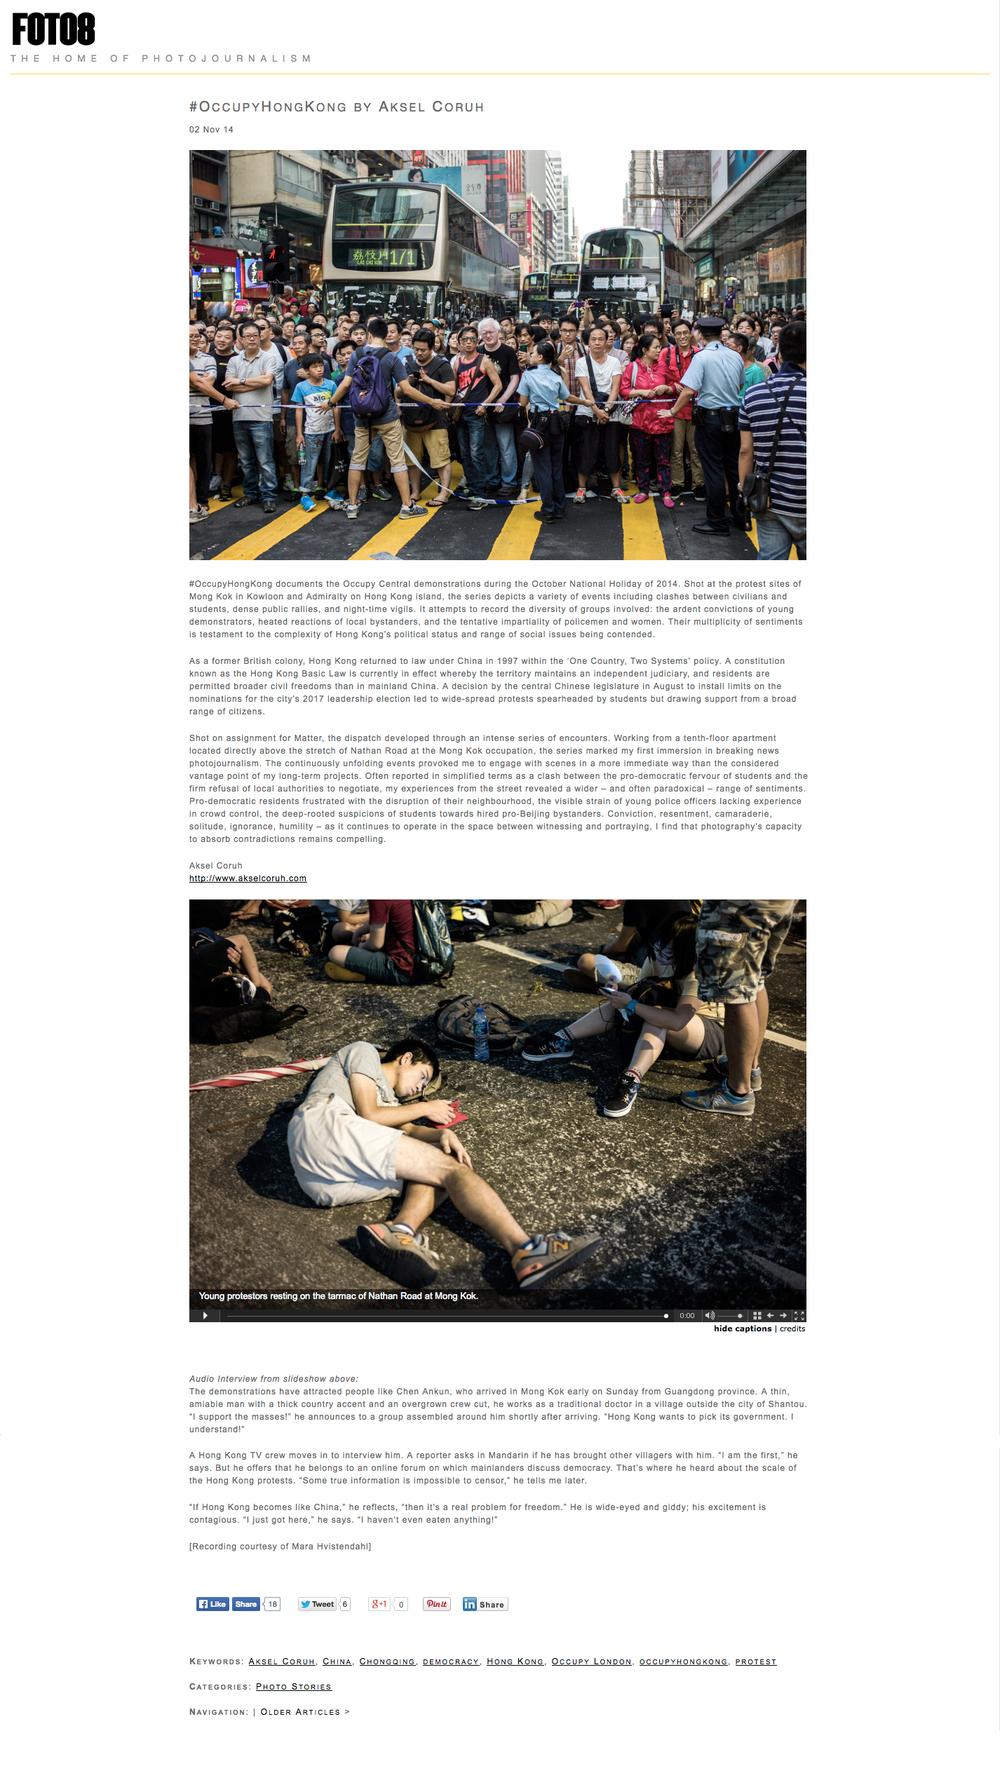 2014_Clippings_Foto8_OccupyHongKong_20141102.jpg